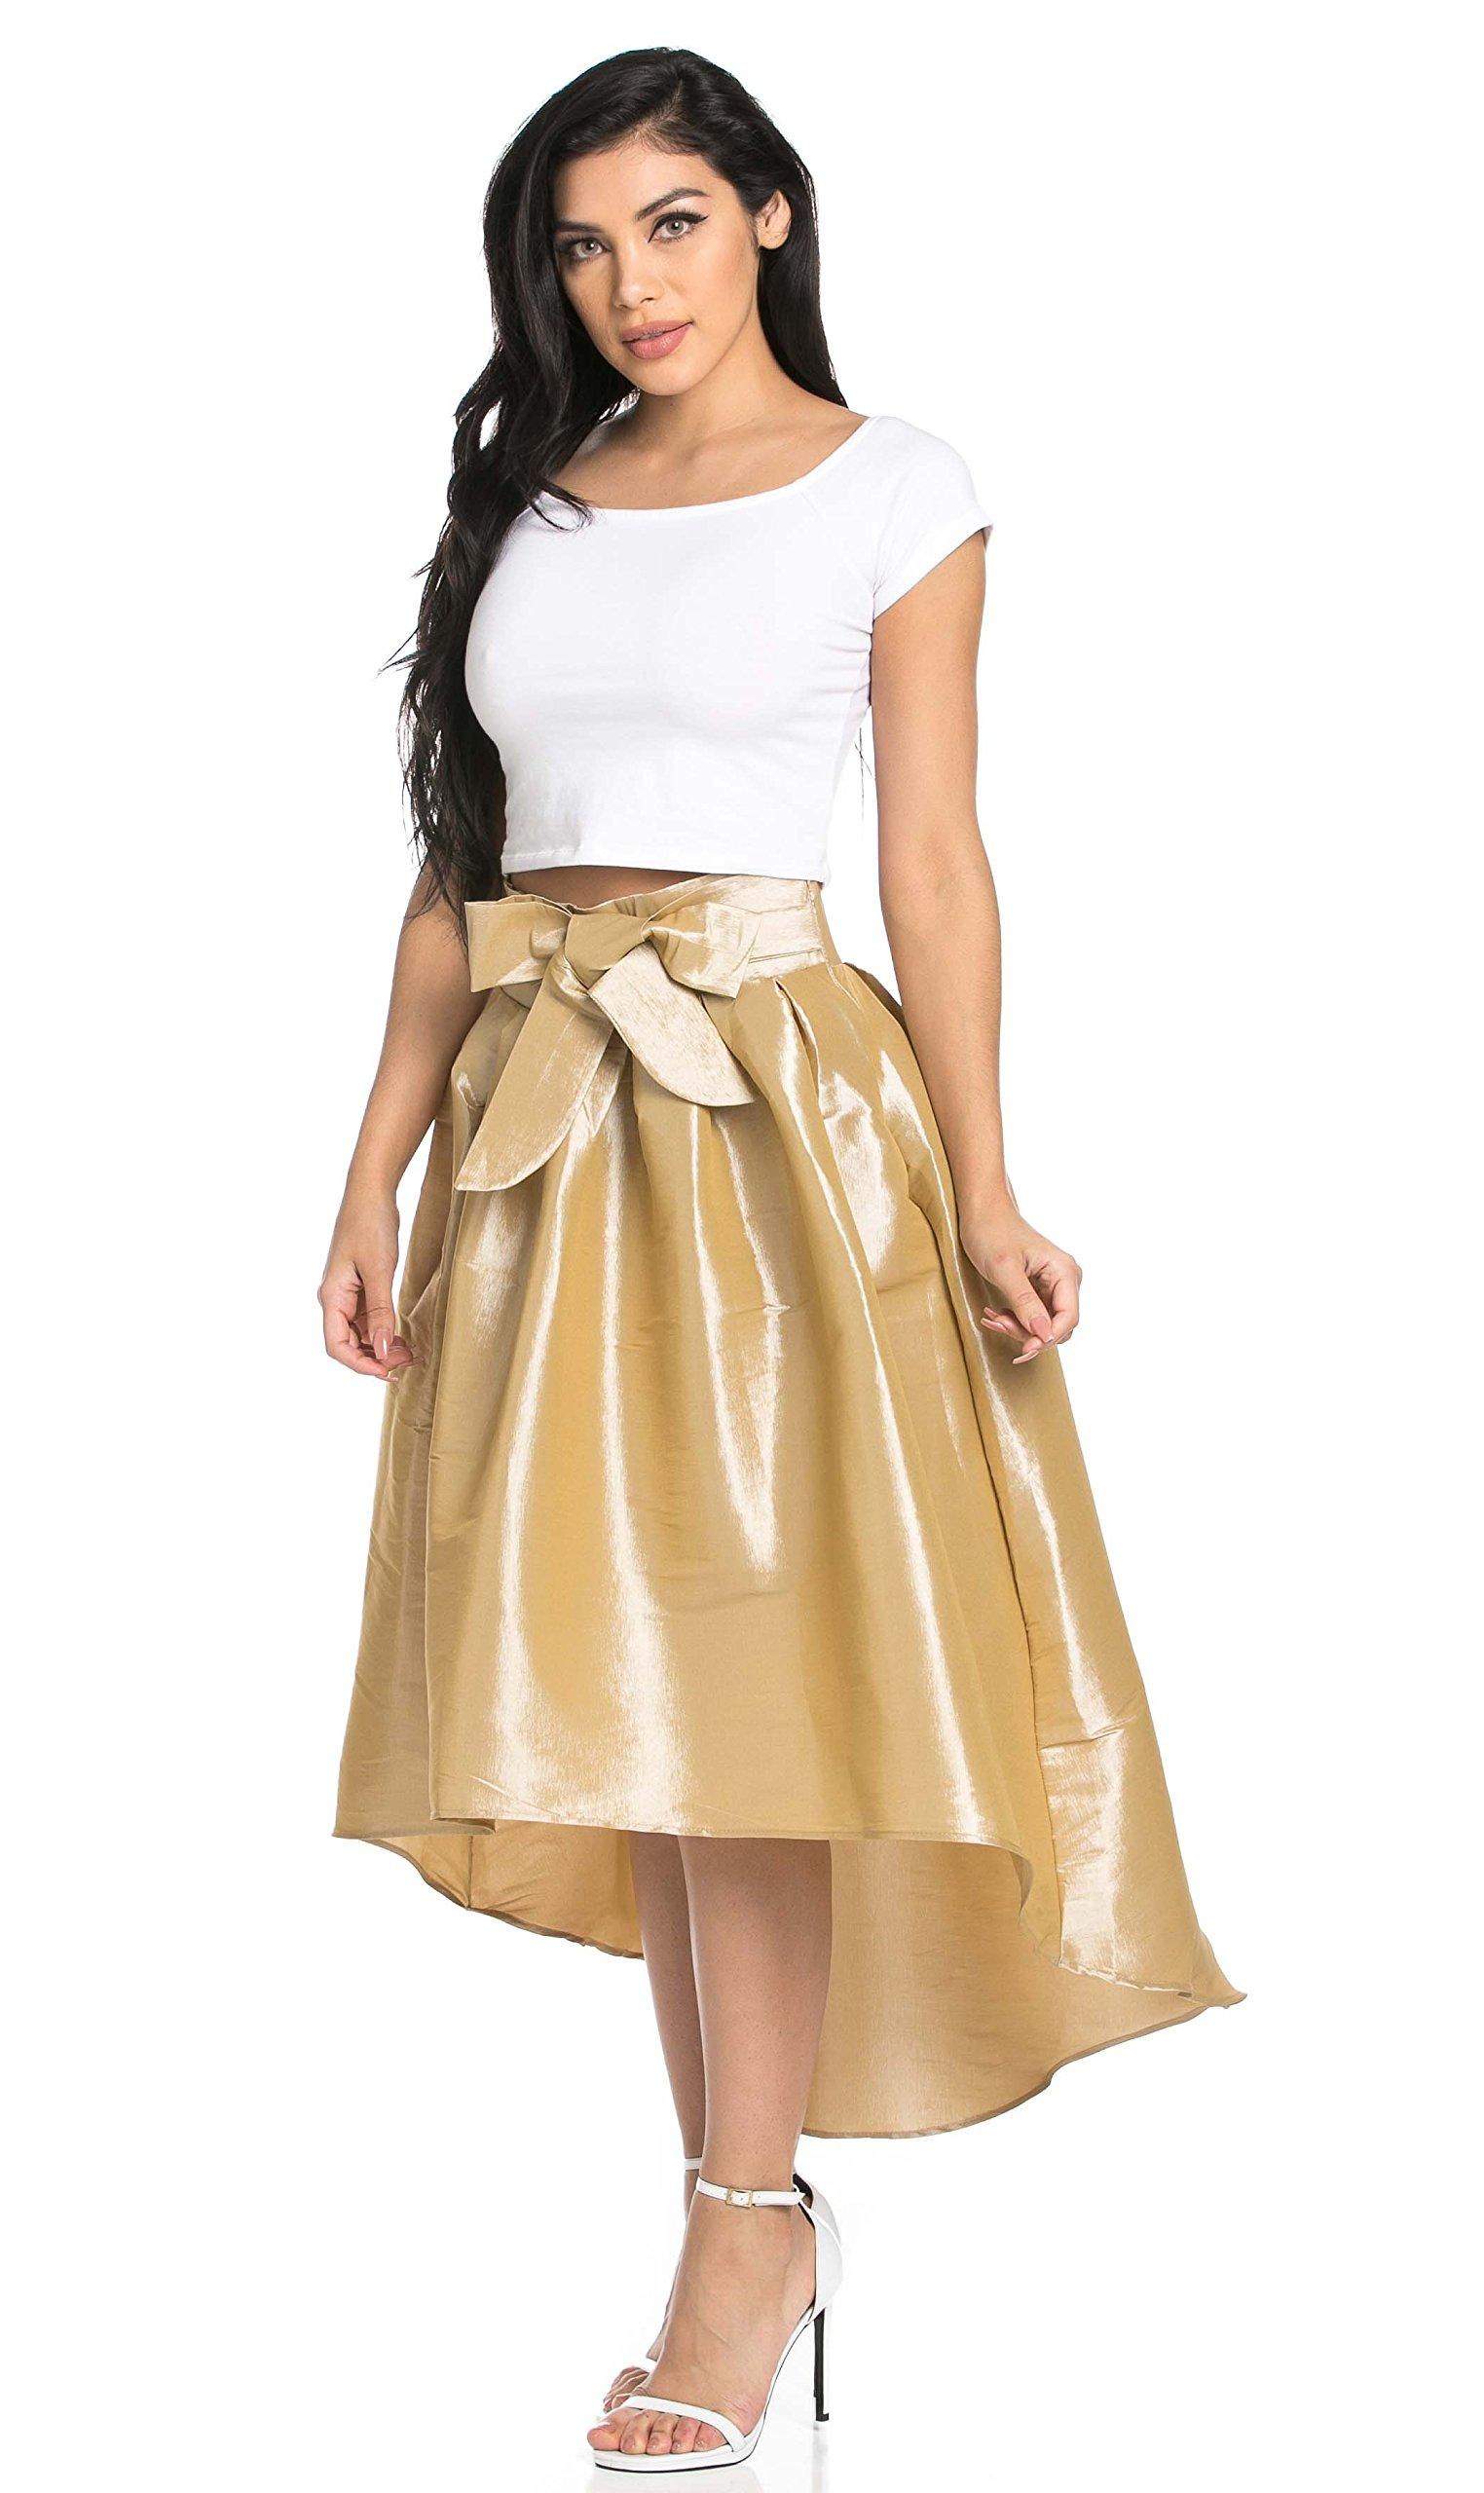 SOHO GLAM High-Low Taffeta Pleated Midi-Skirt in Stone